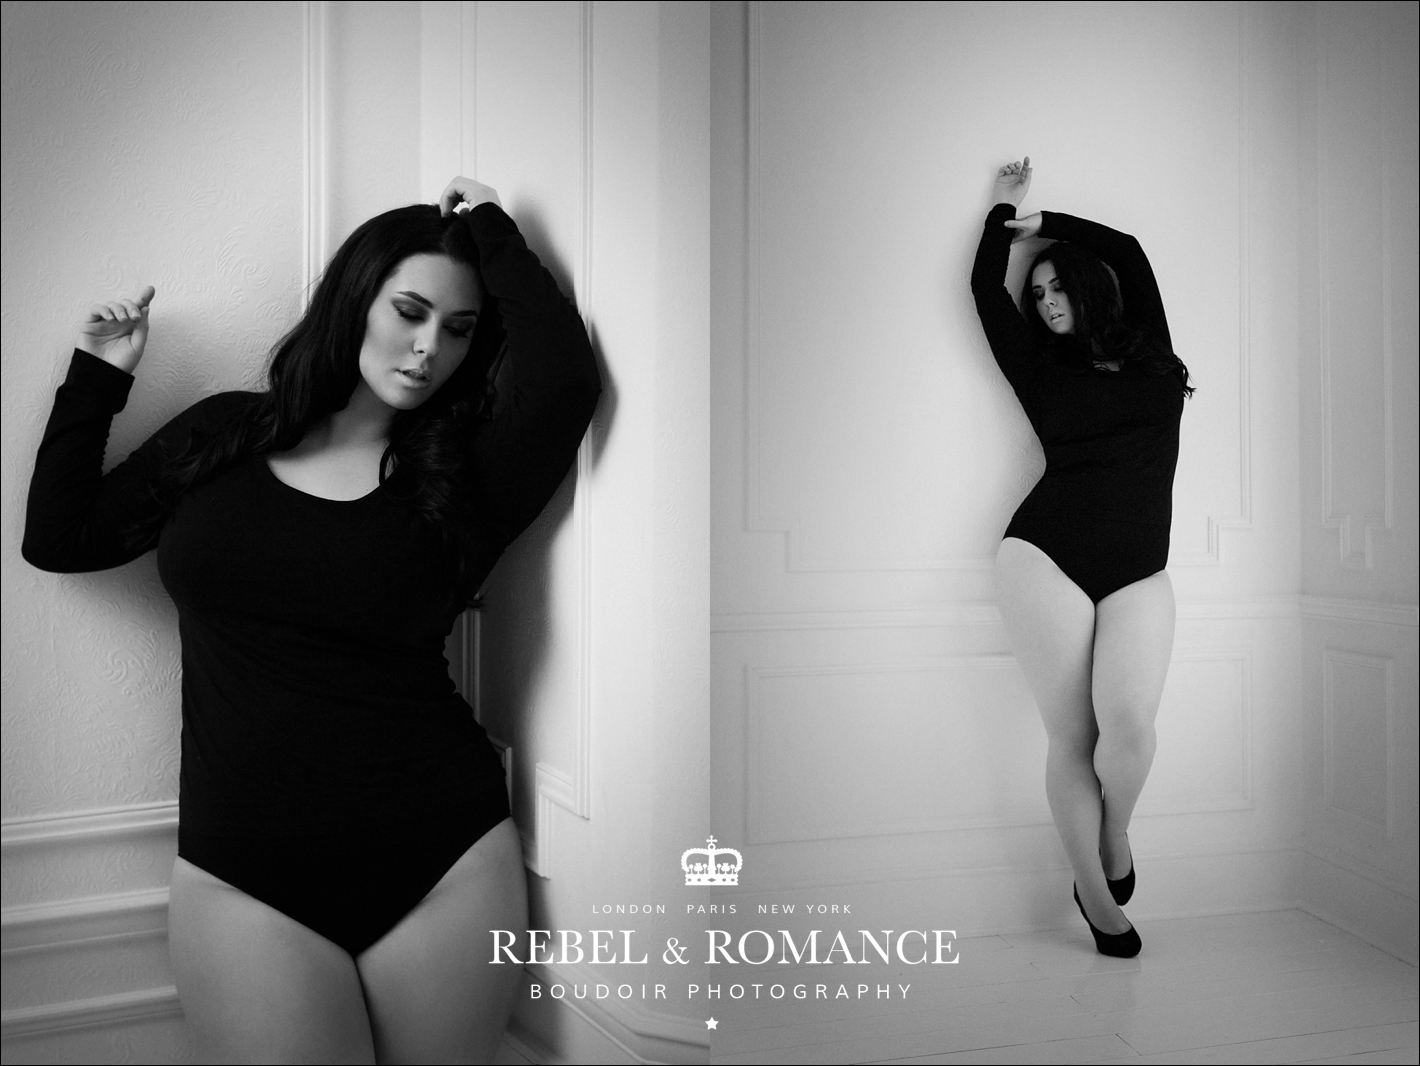 RebelandRomance_J-17